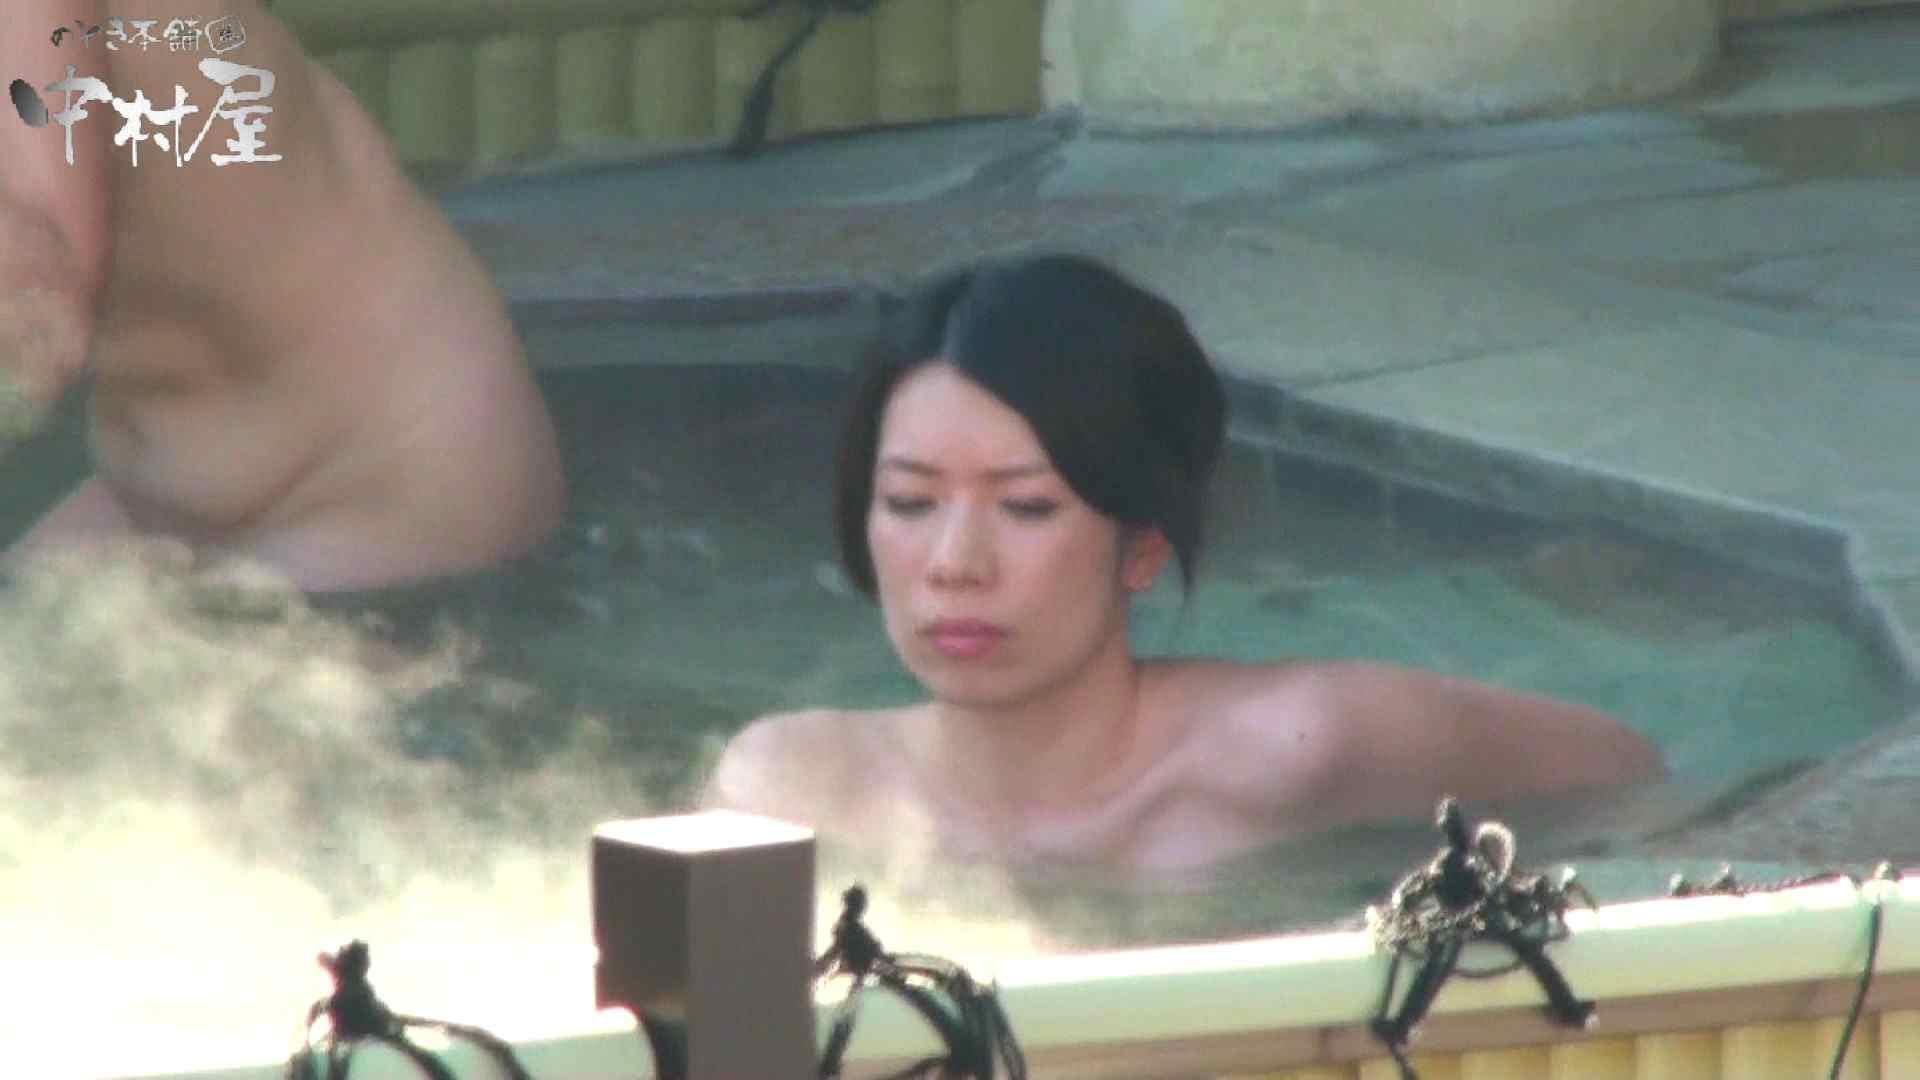 Aquaな露天風呂Vol.919 盗撮 おまんこ無修正動画無料 91連発 68